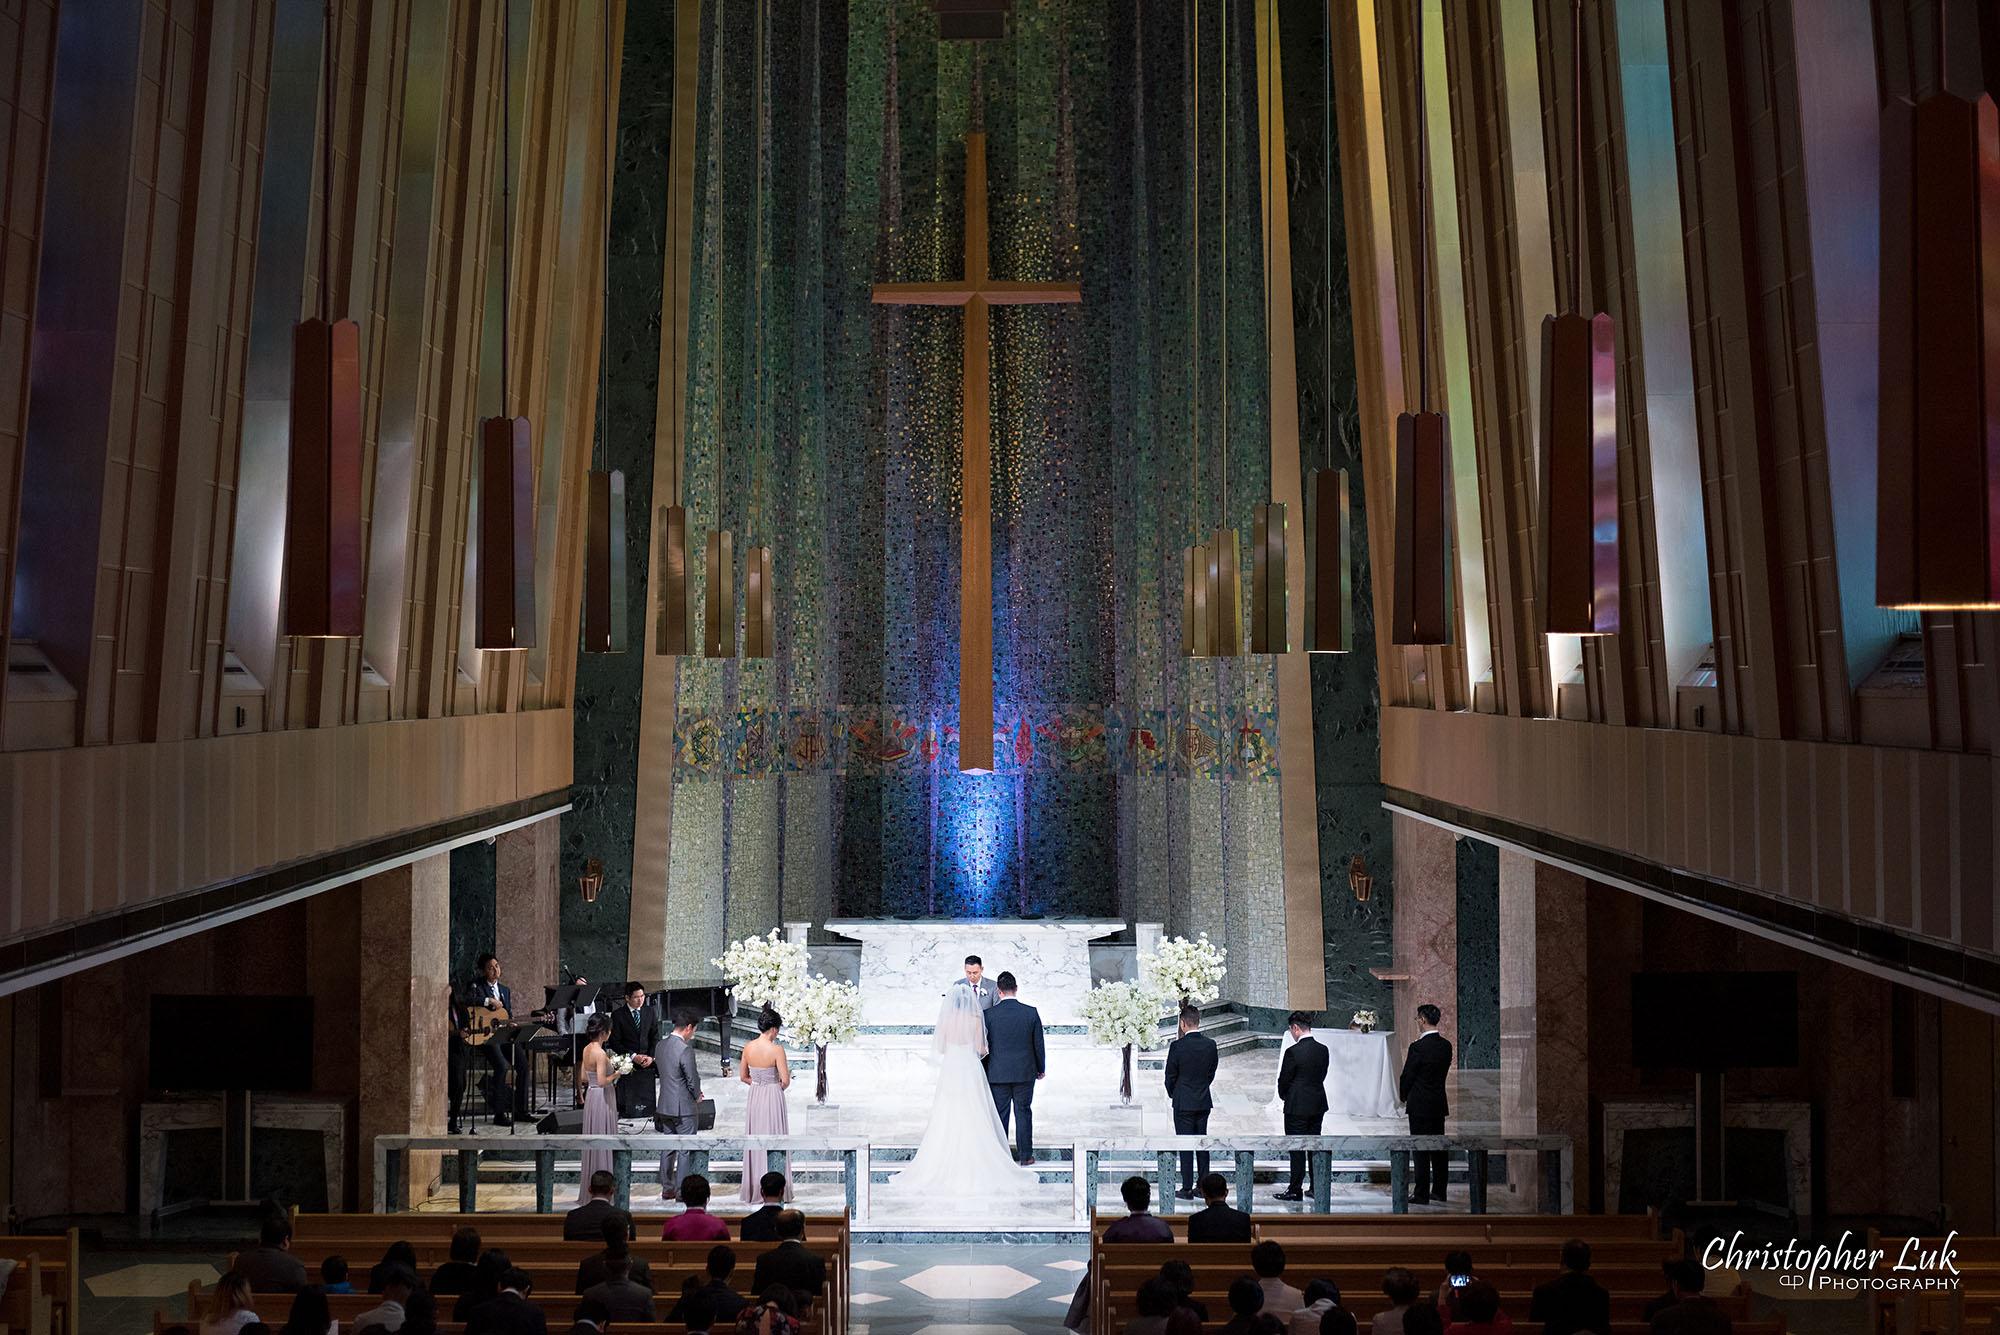 Christopher Luk Toronto Wedding Photography Tyndale Chapel Church Ceremony Venue Location Bride Groom Altar Stained Glass Windows Balcony Detail